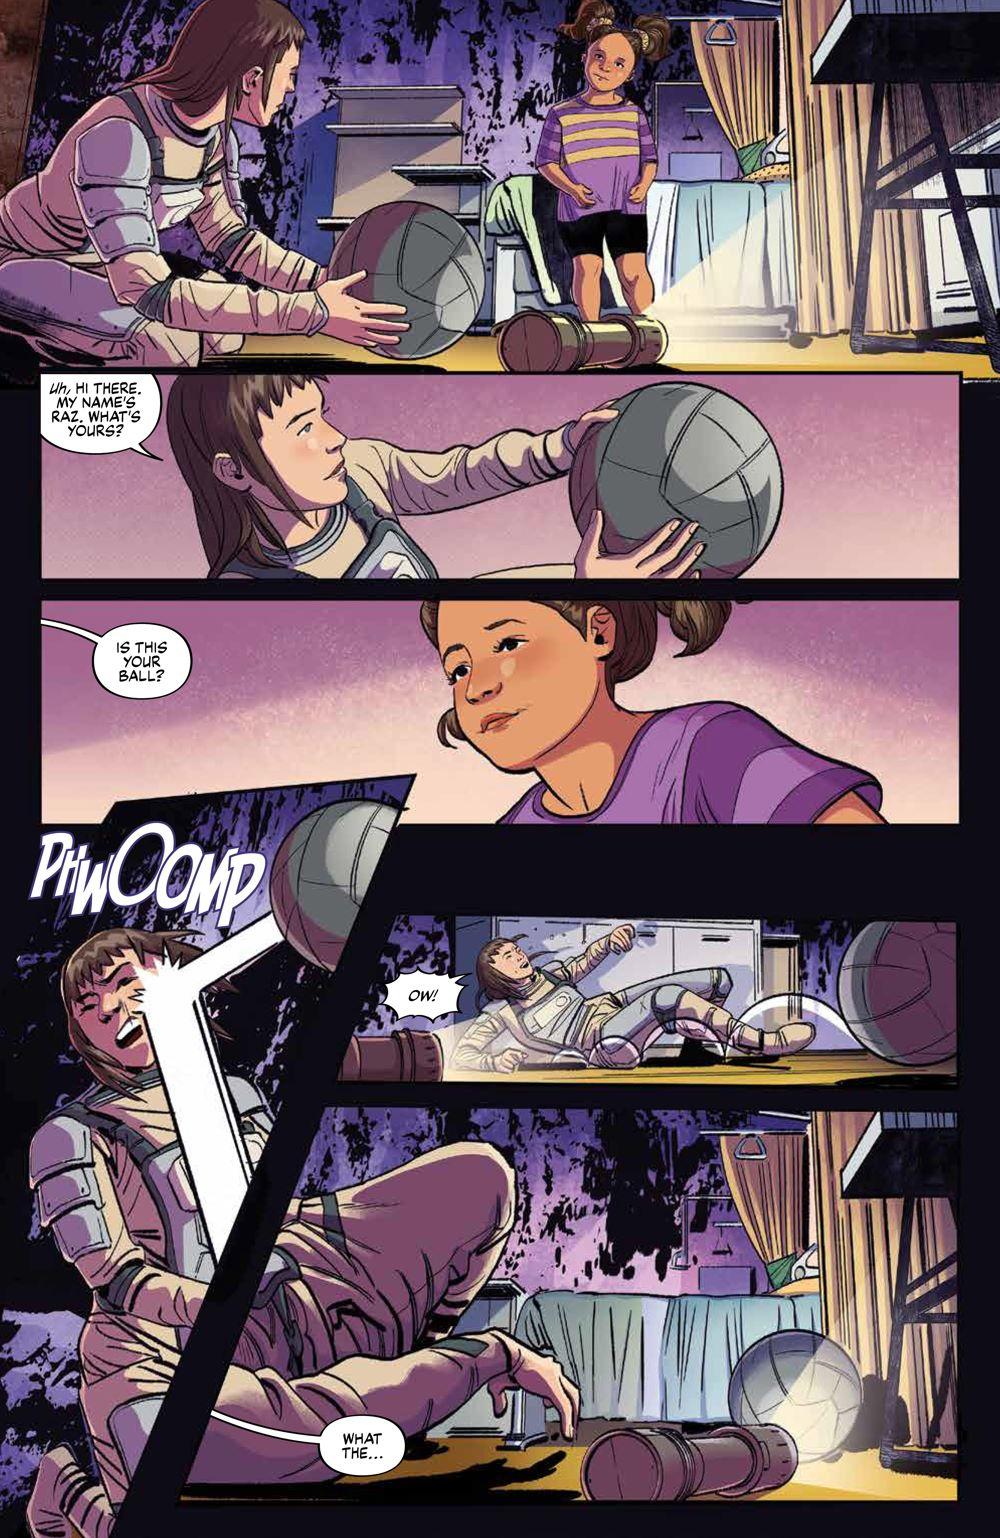 Firefly_BrandNewVerse_005_PRESS_6 ComicList Previews: FIREFLY BRAND NEW 'VERSE #5 (OF 6)